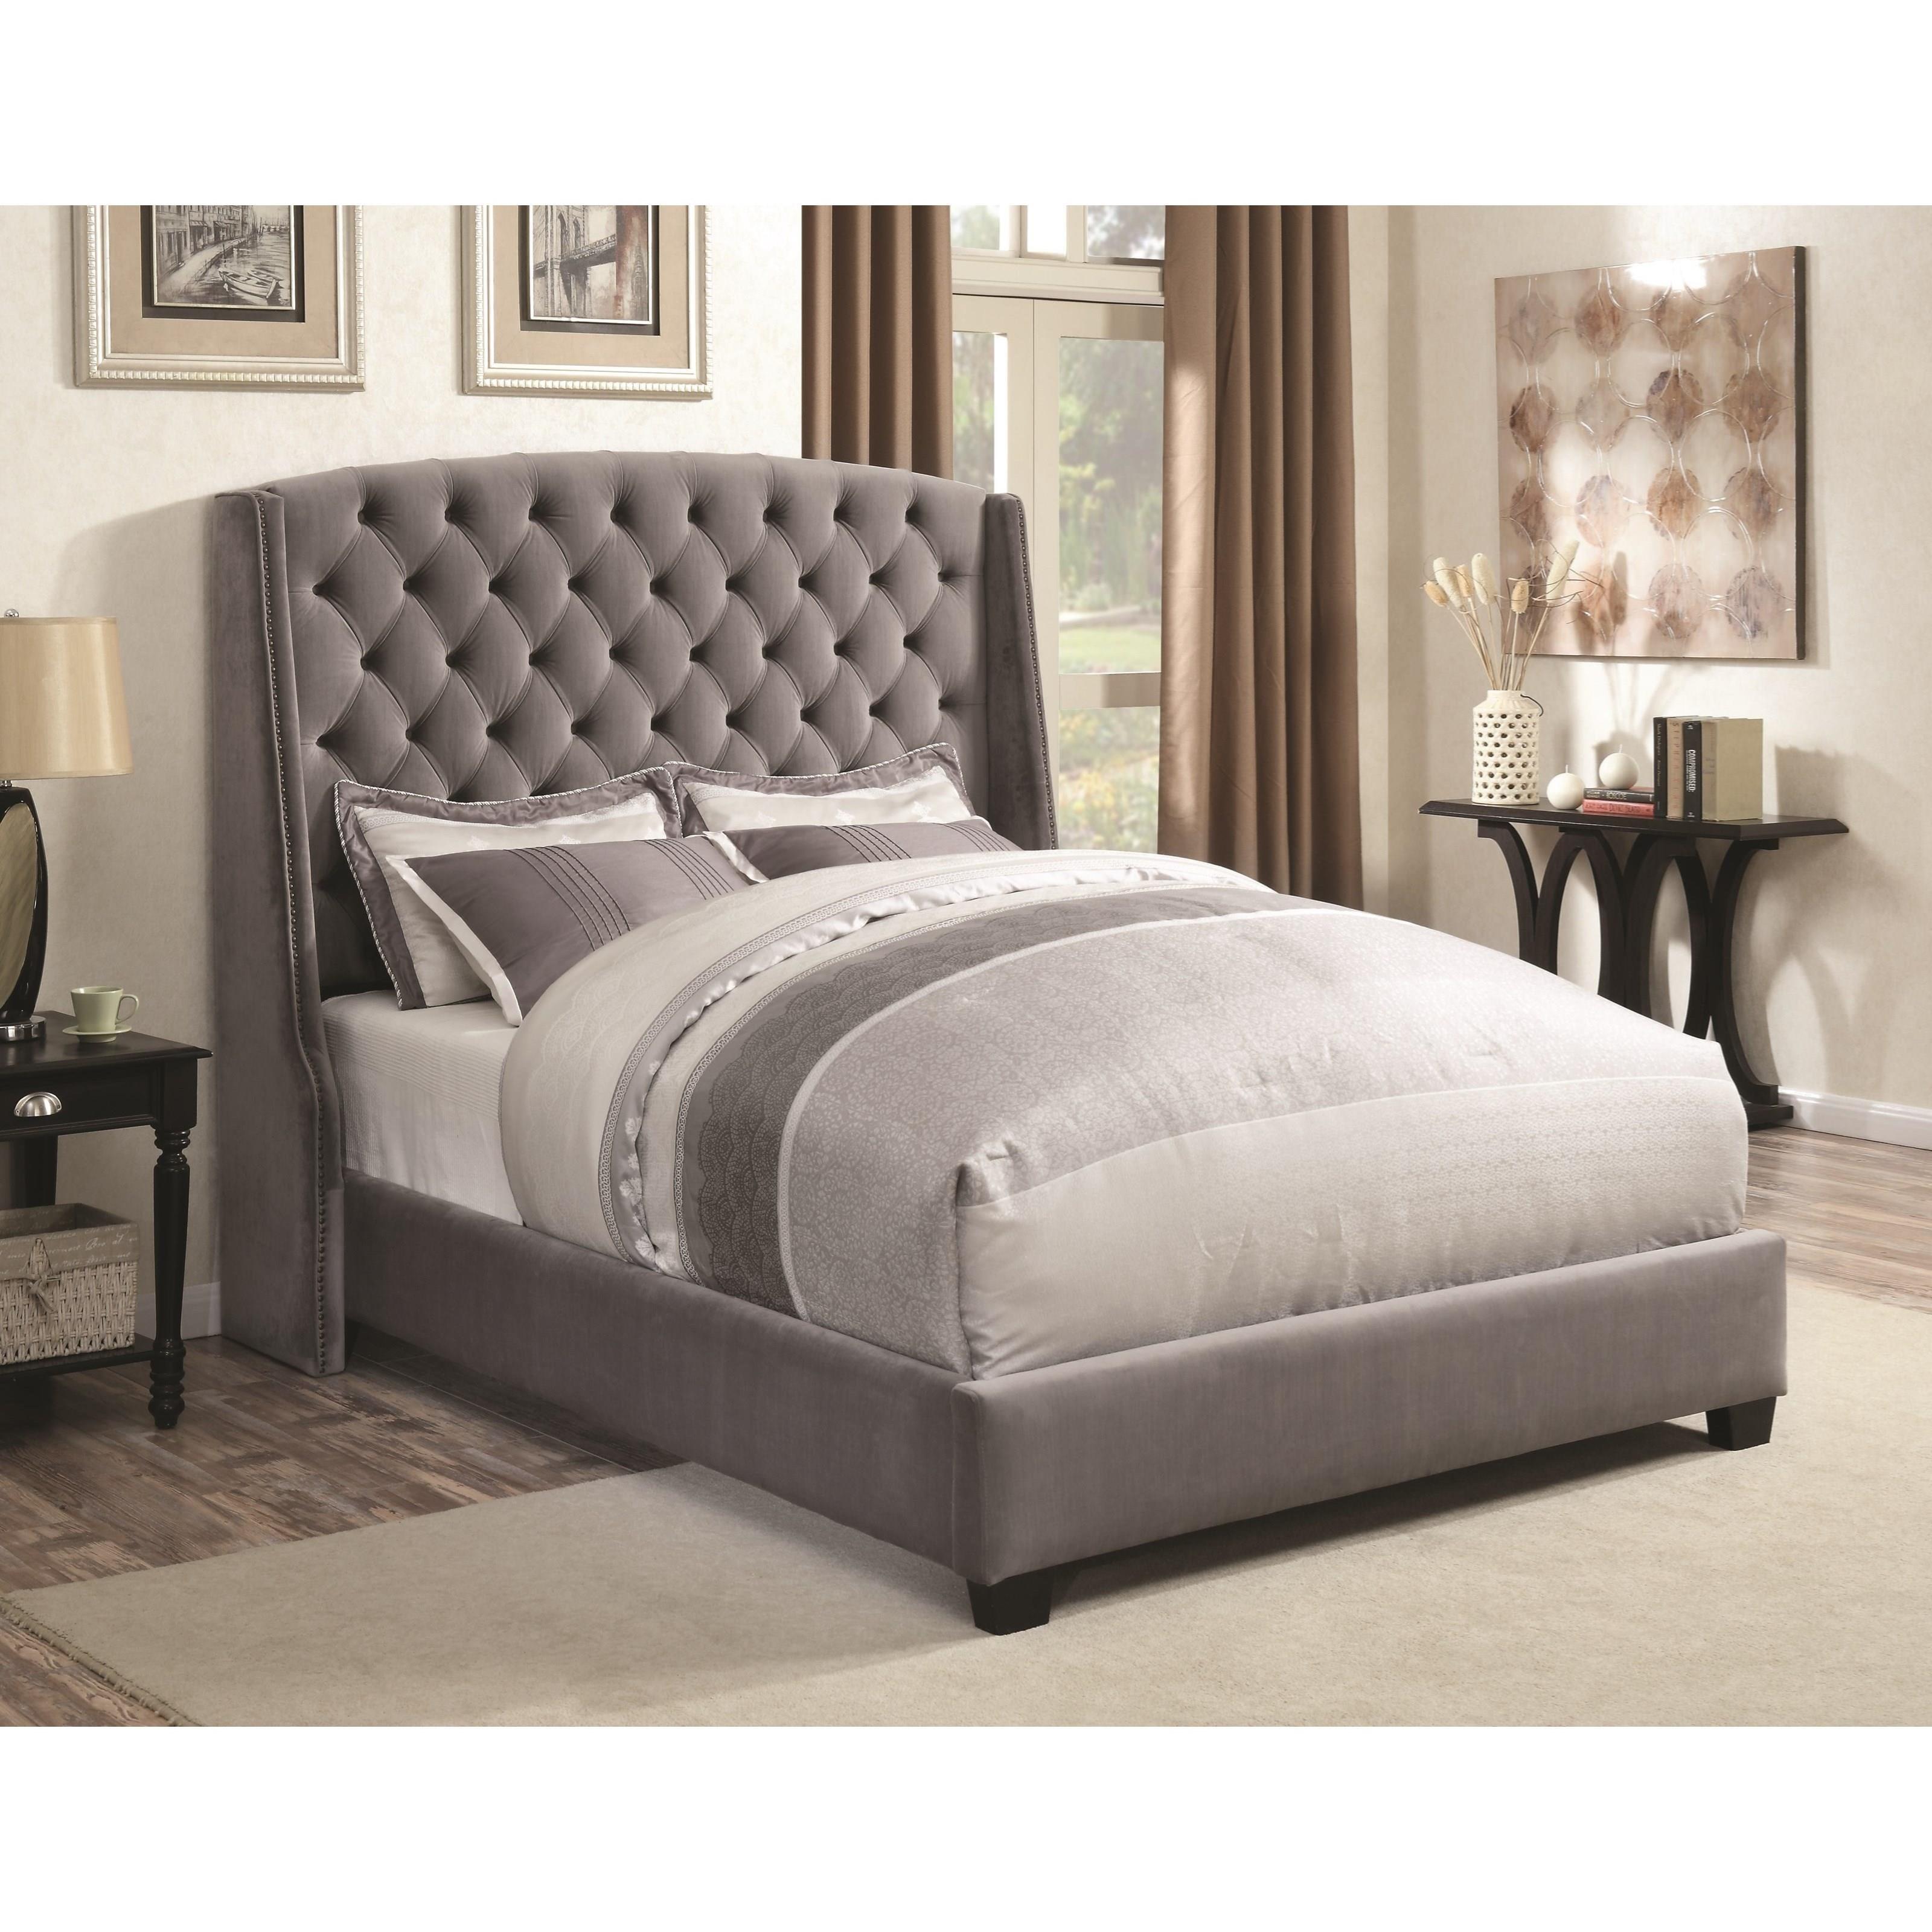 Coaster Upholstered Beds Cal. King Bed - Item Number: 300515KW